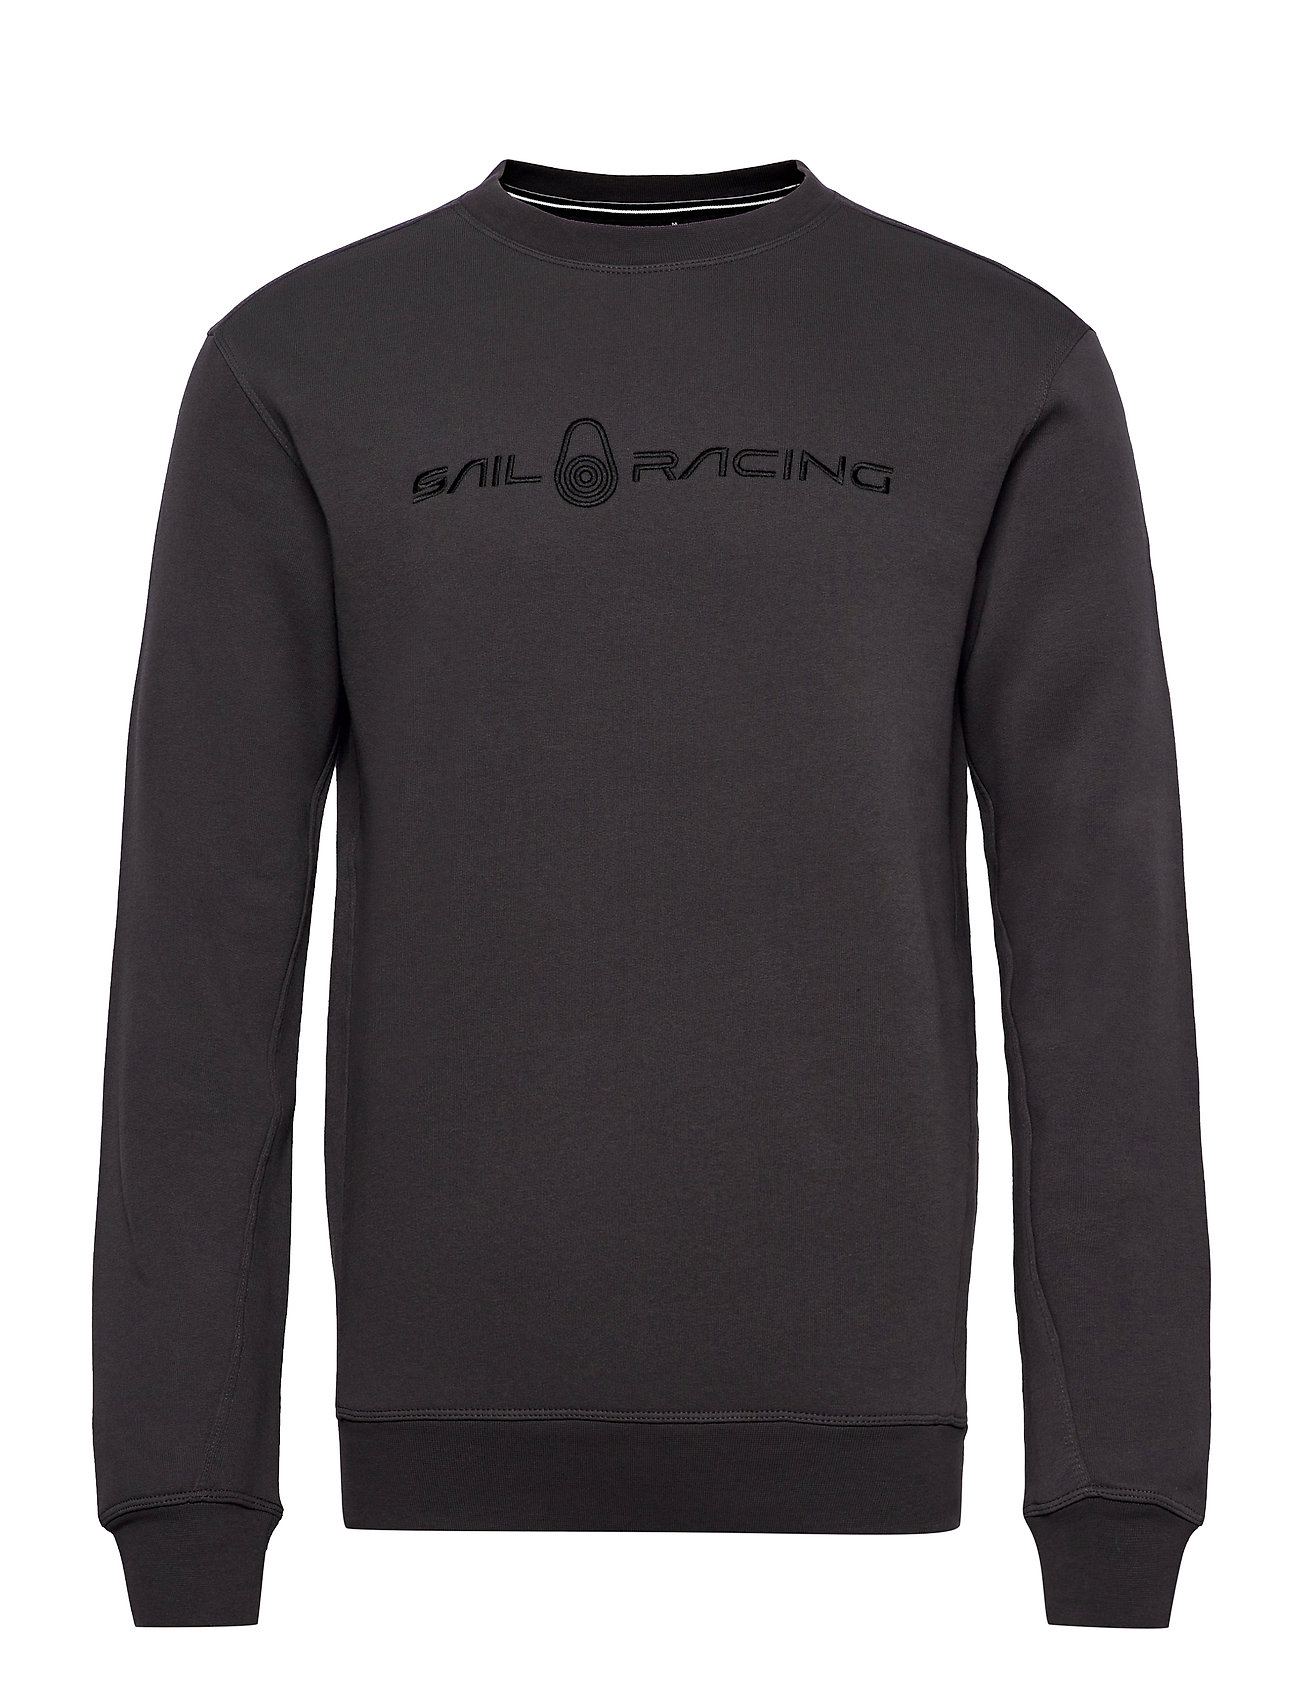 Bowman Sweater Sweatshirt Trøje Grå Sail Racing